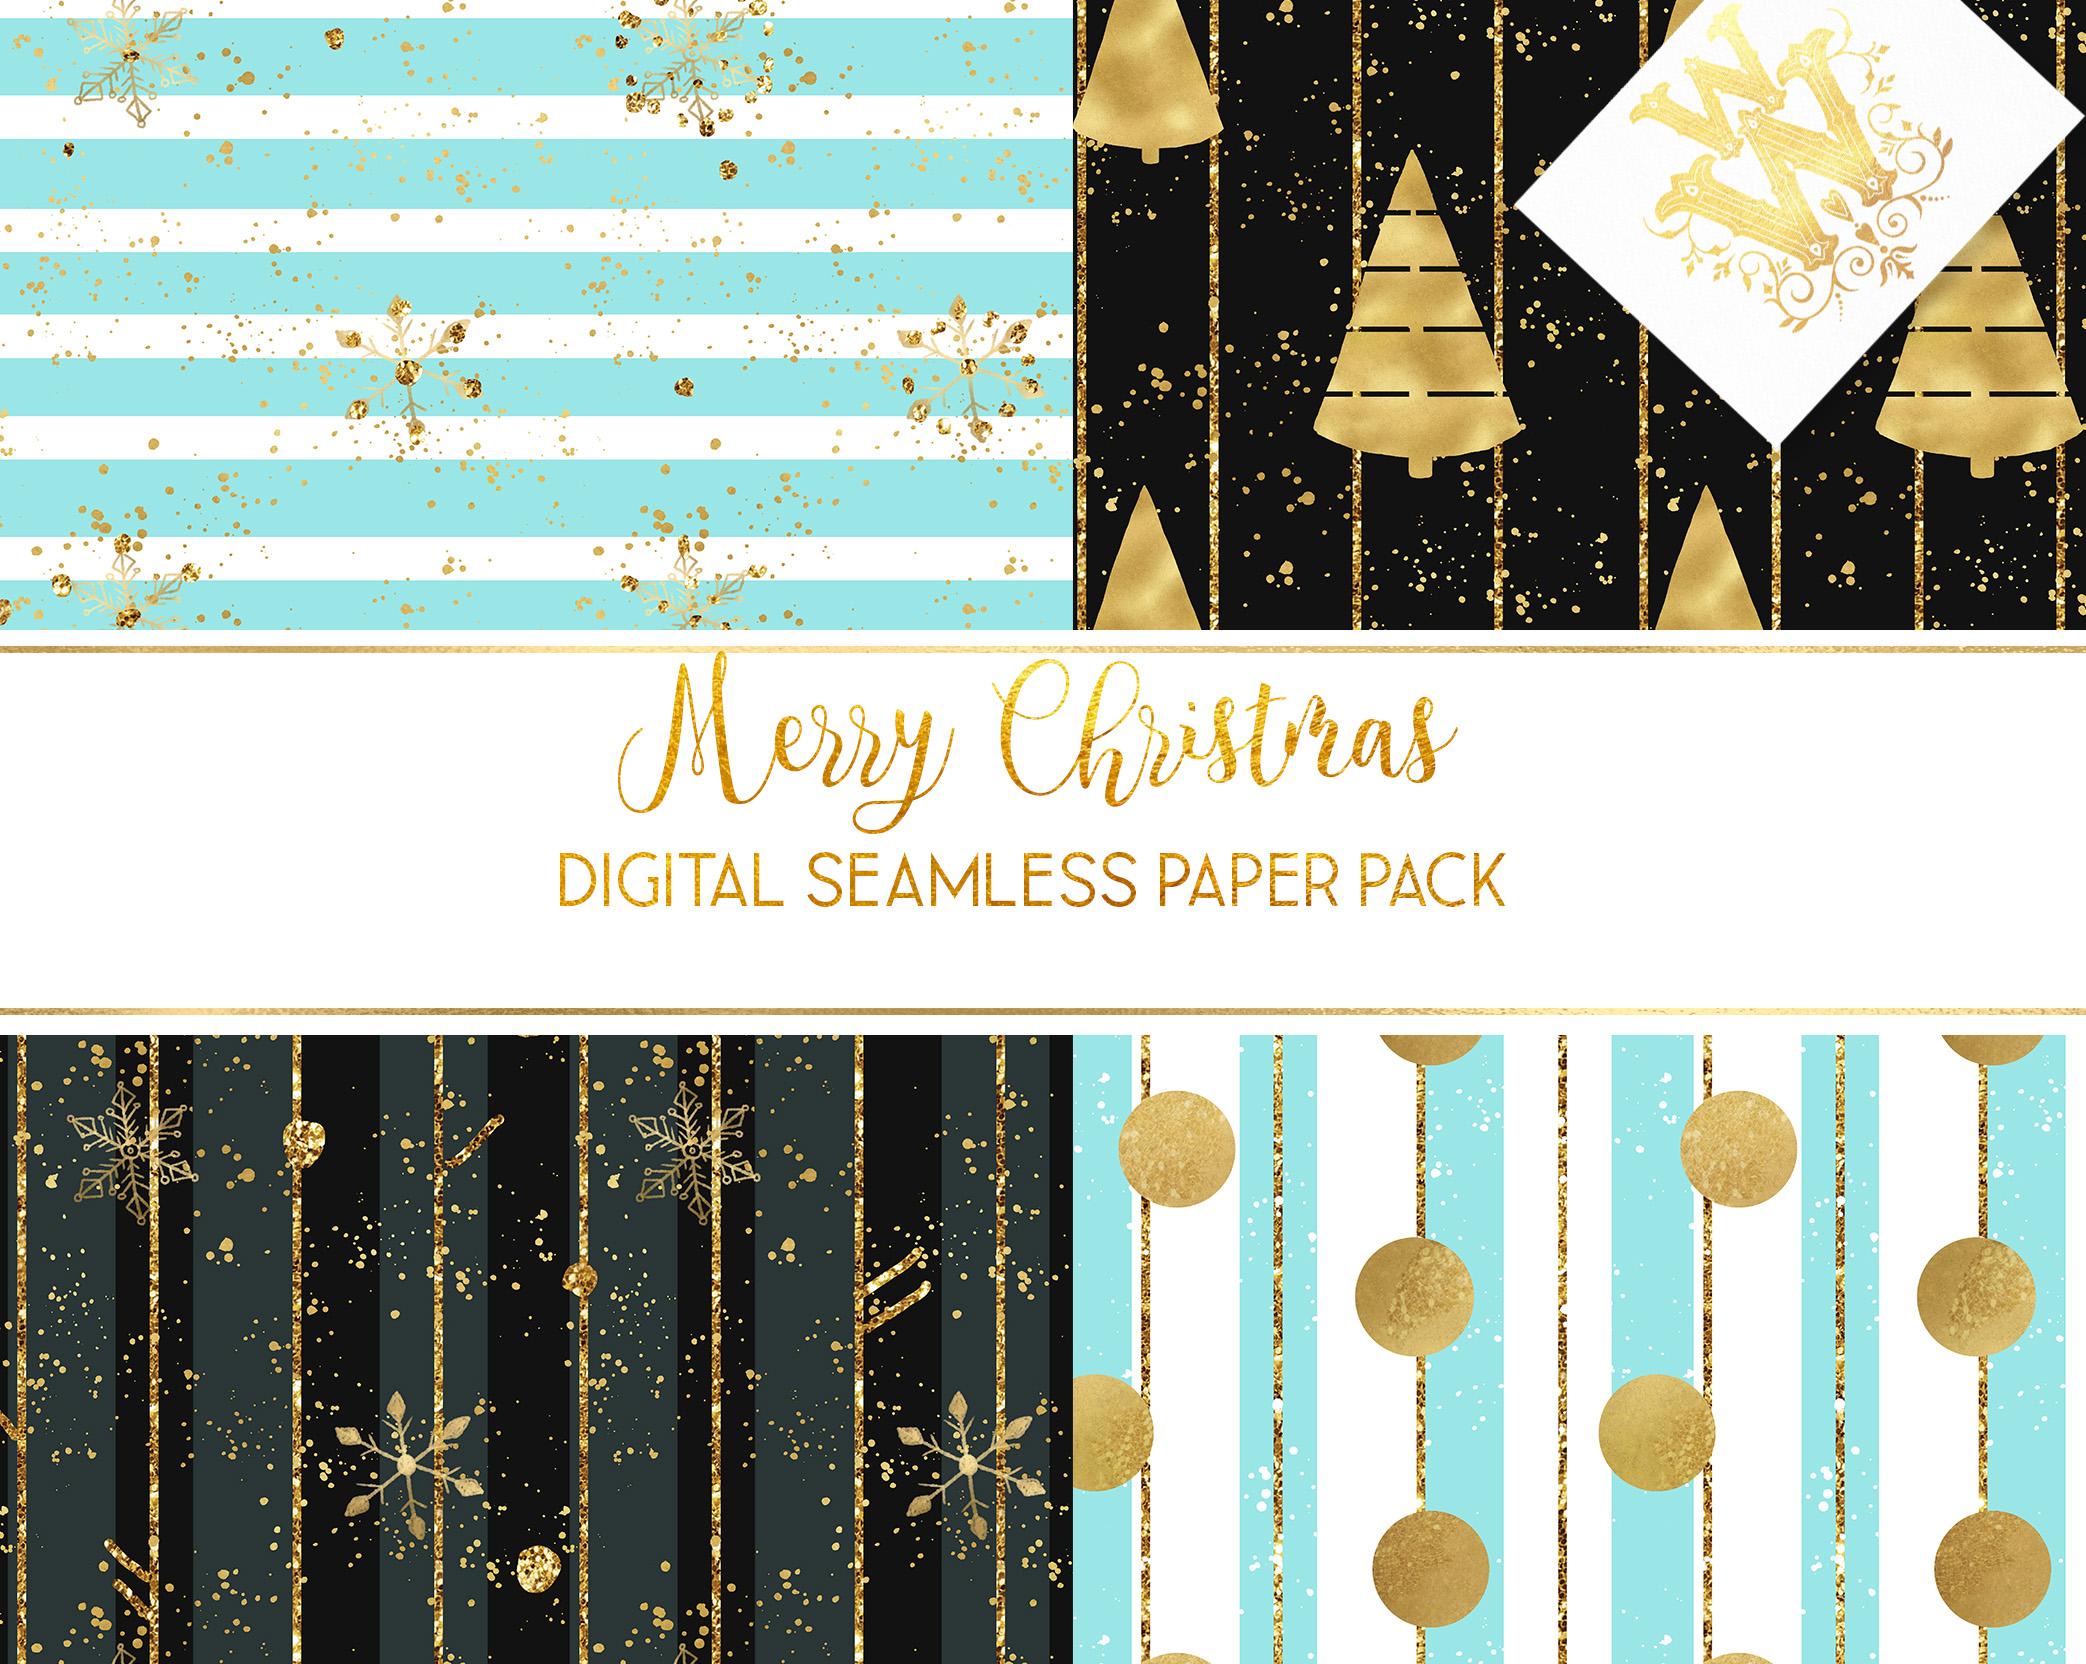 Christmas digital paper pack, seamless pattern snowflake example image 4